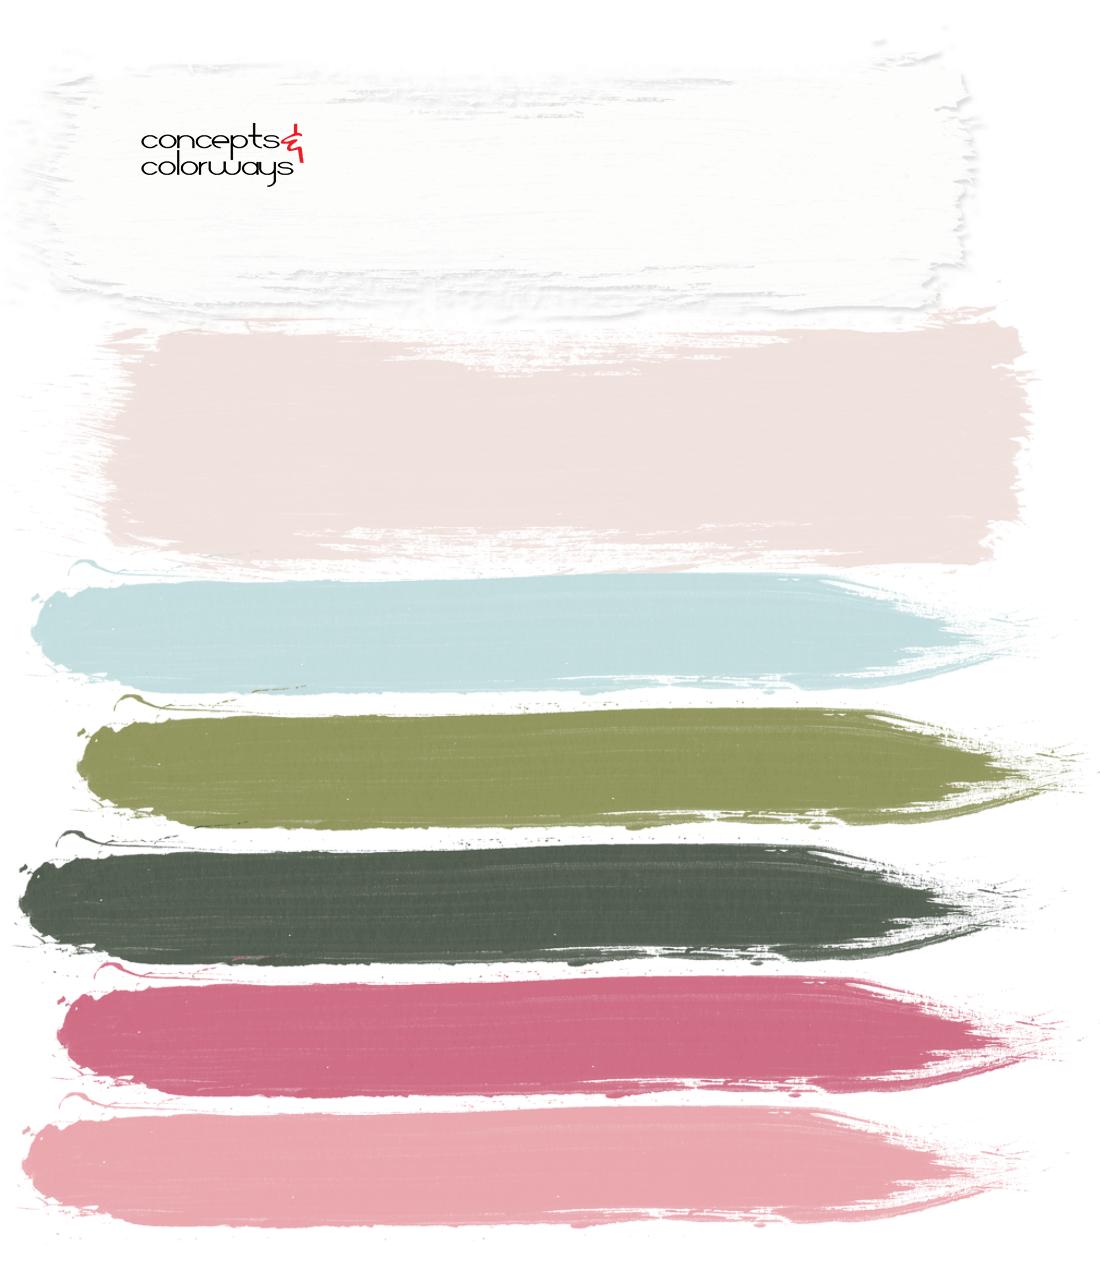 bubblegum pink, pink and green, blush pink, blush pink walls, aqua blue, turquoise blue, sage green, dark green, pretty color palettes, feminine color palette, color palette, pink blooms, blooming garden, paint palette